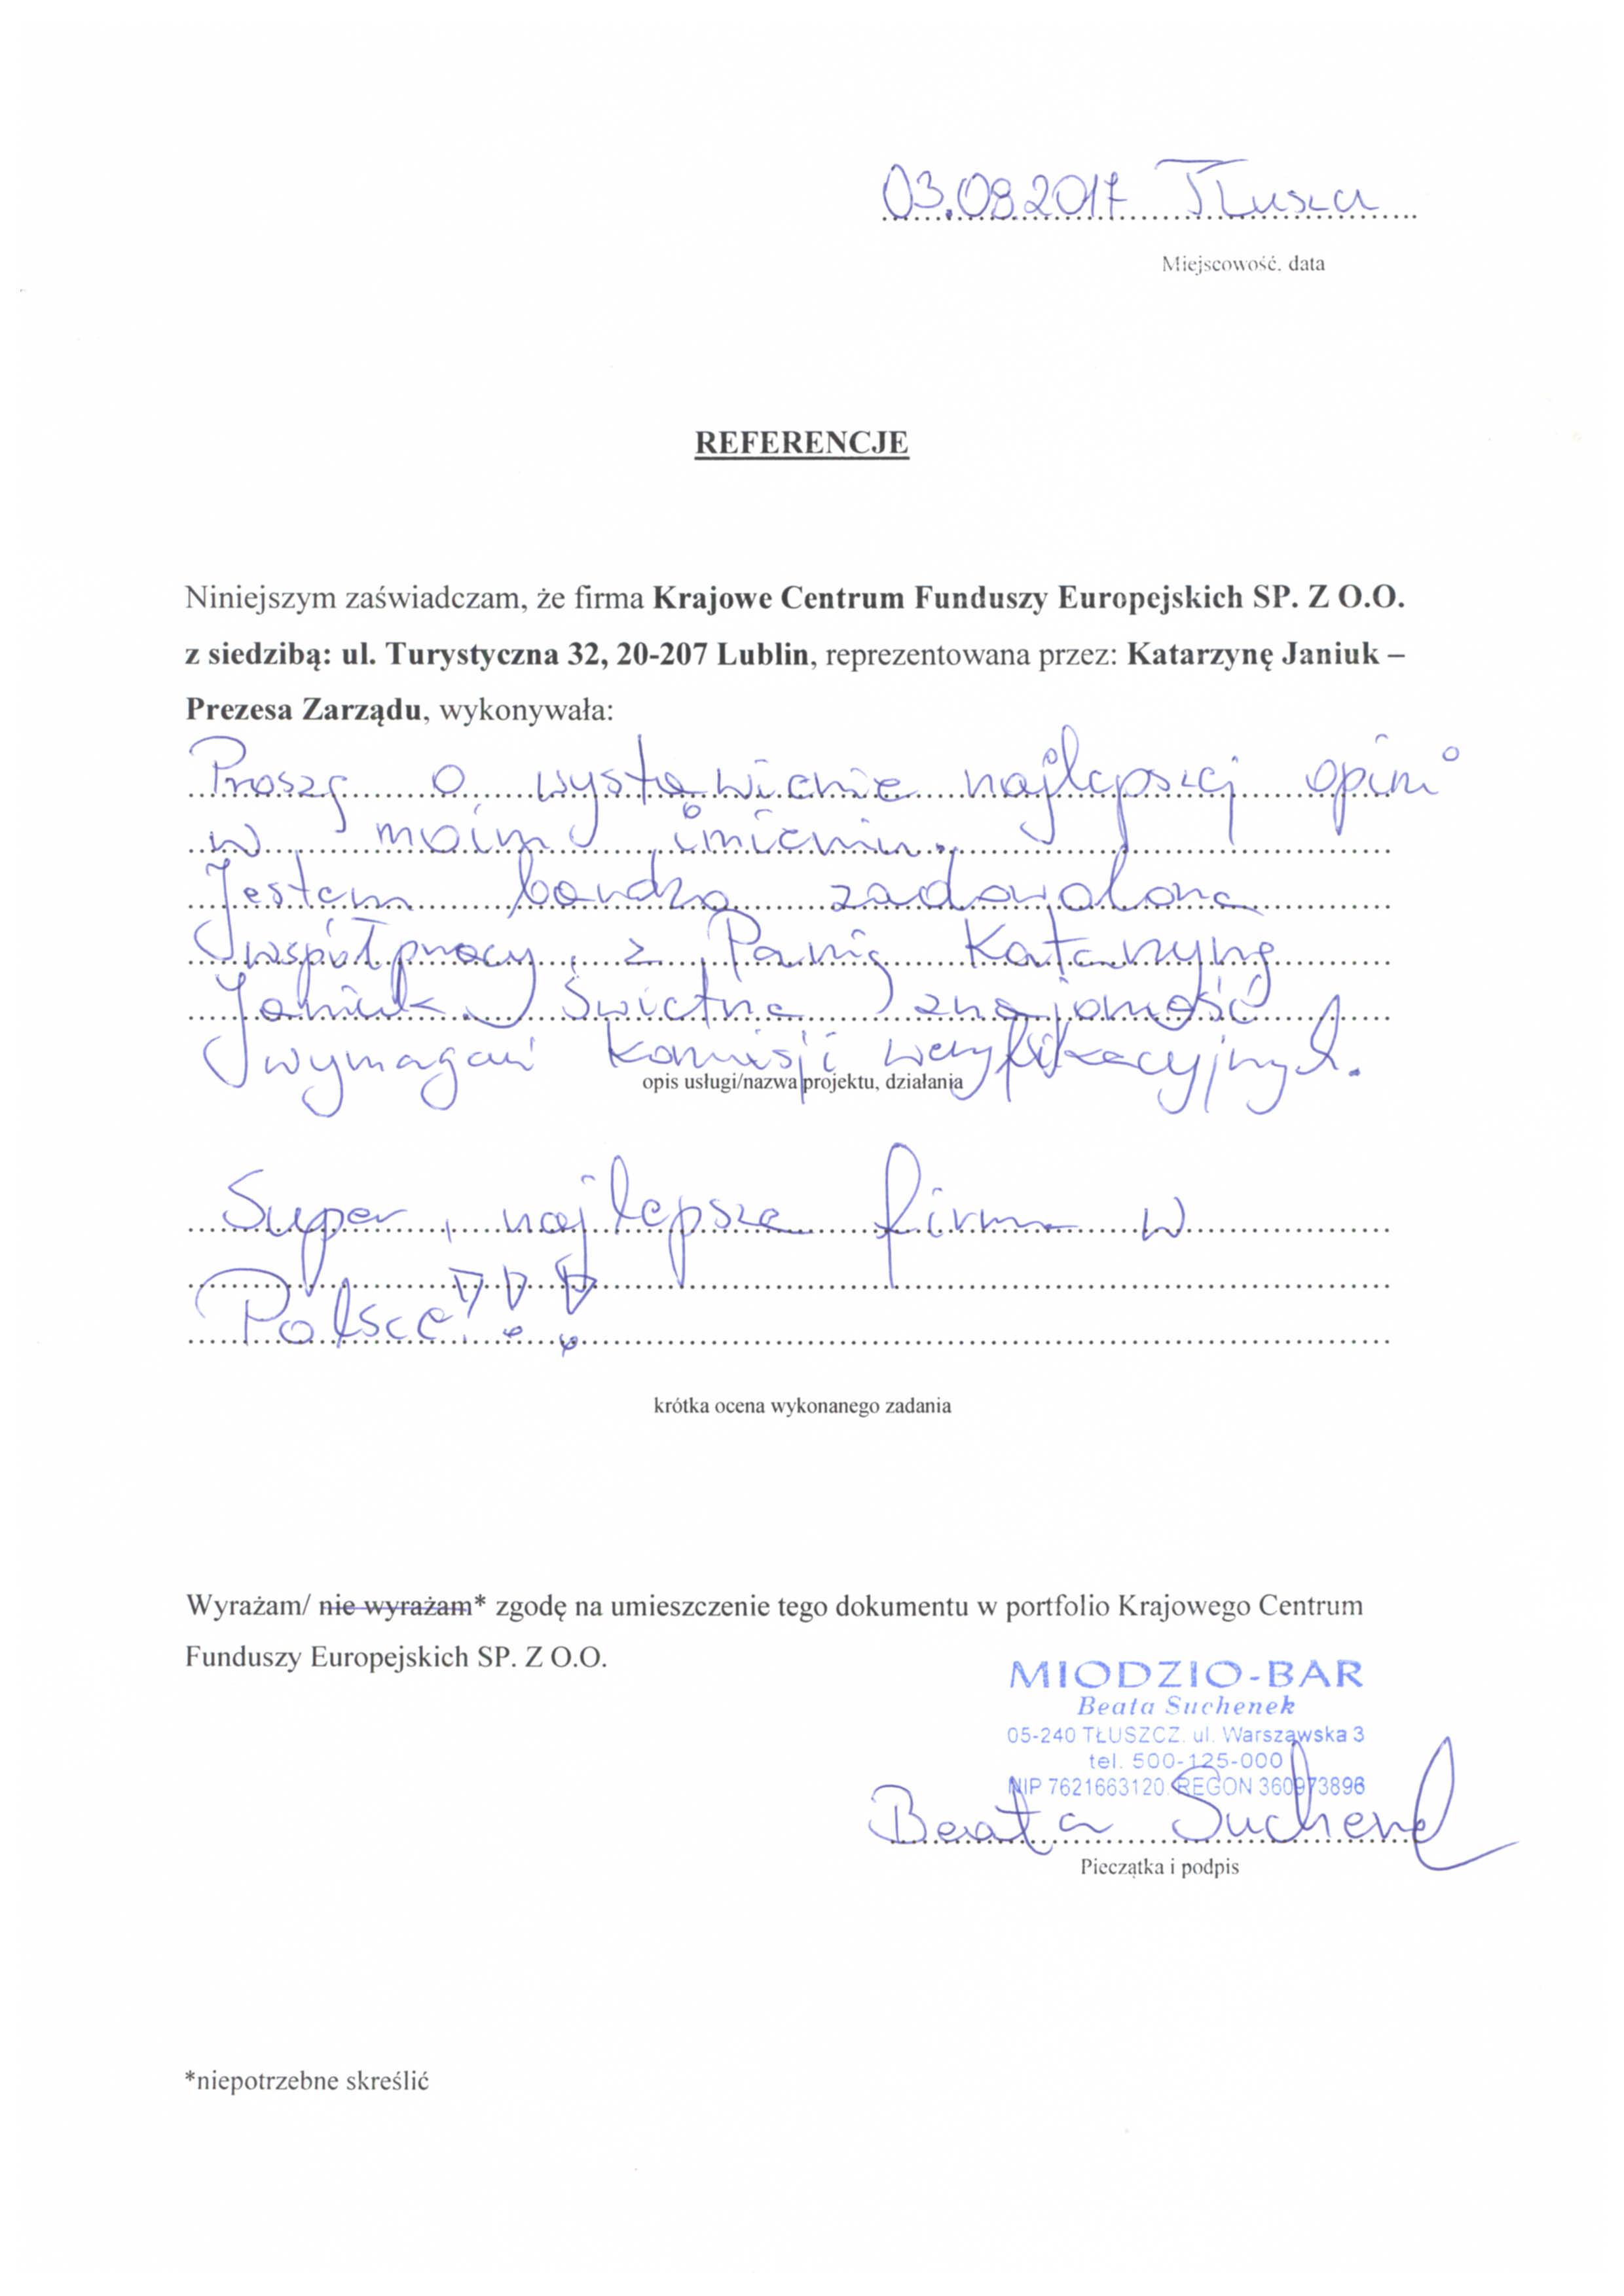 Referencje Miodzio-Bar 03.08.2017 - JPG